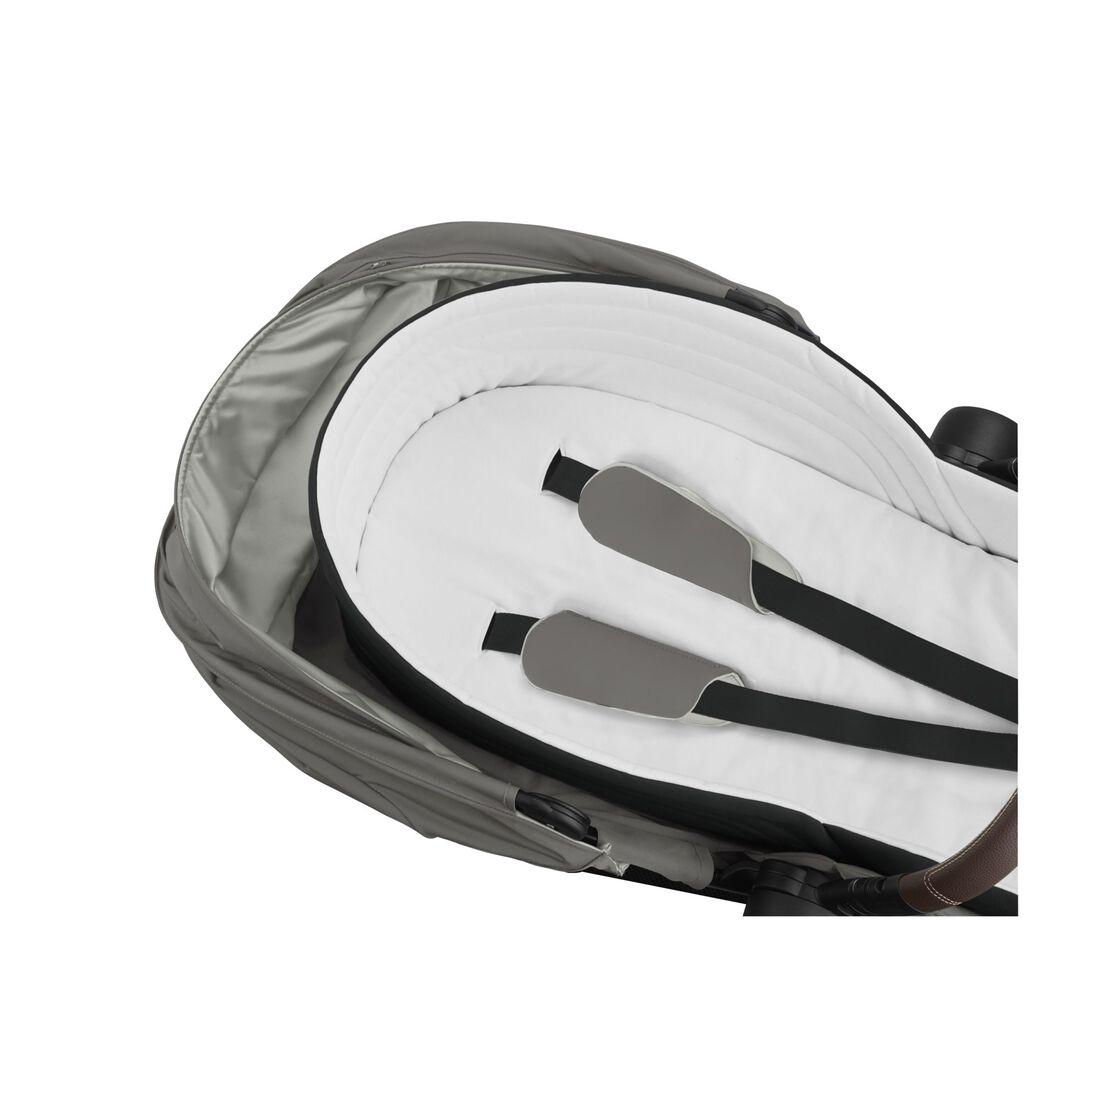 CYBEX Lite Cot - Soho Grey in Soho Grey large Bild 2